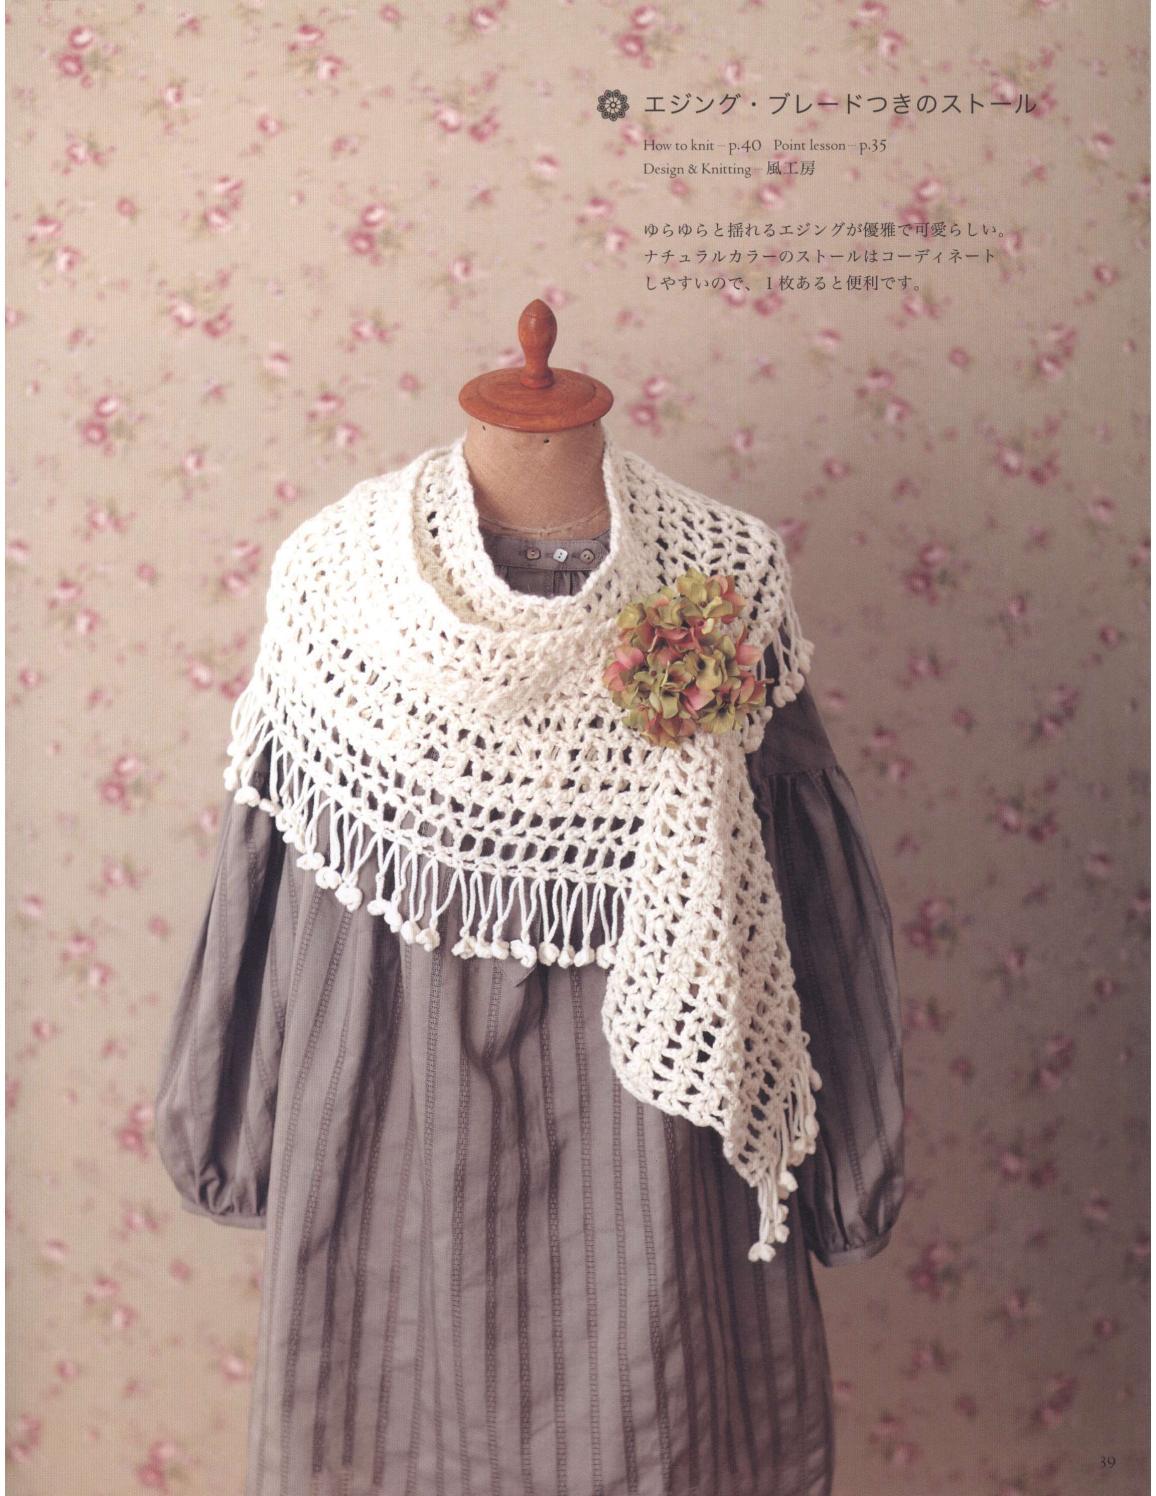 Asahi original crochet best selection 2012 page 39